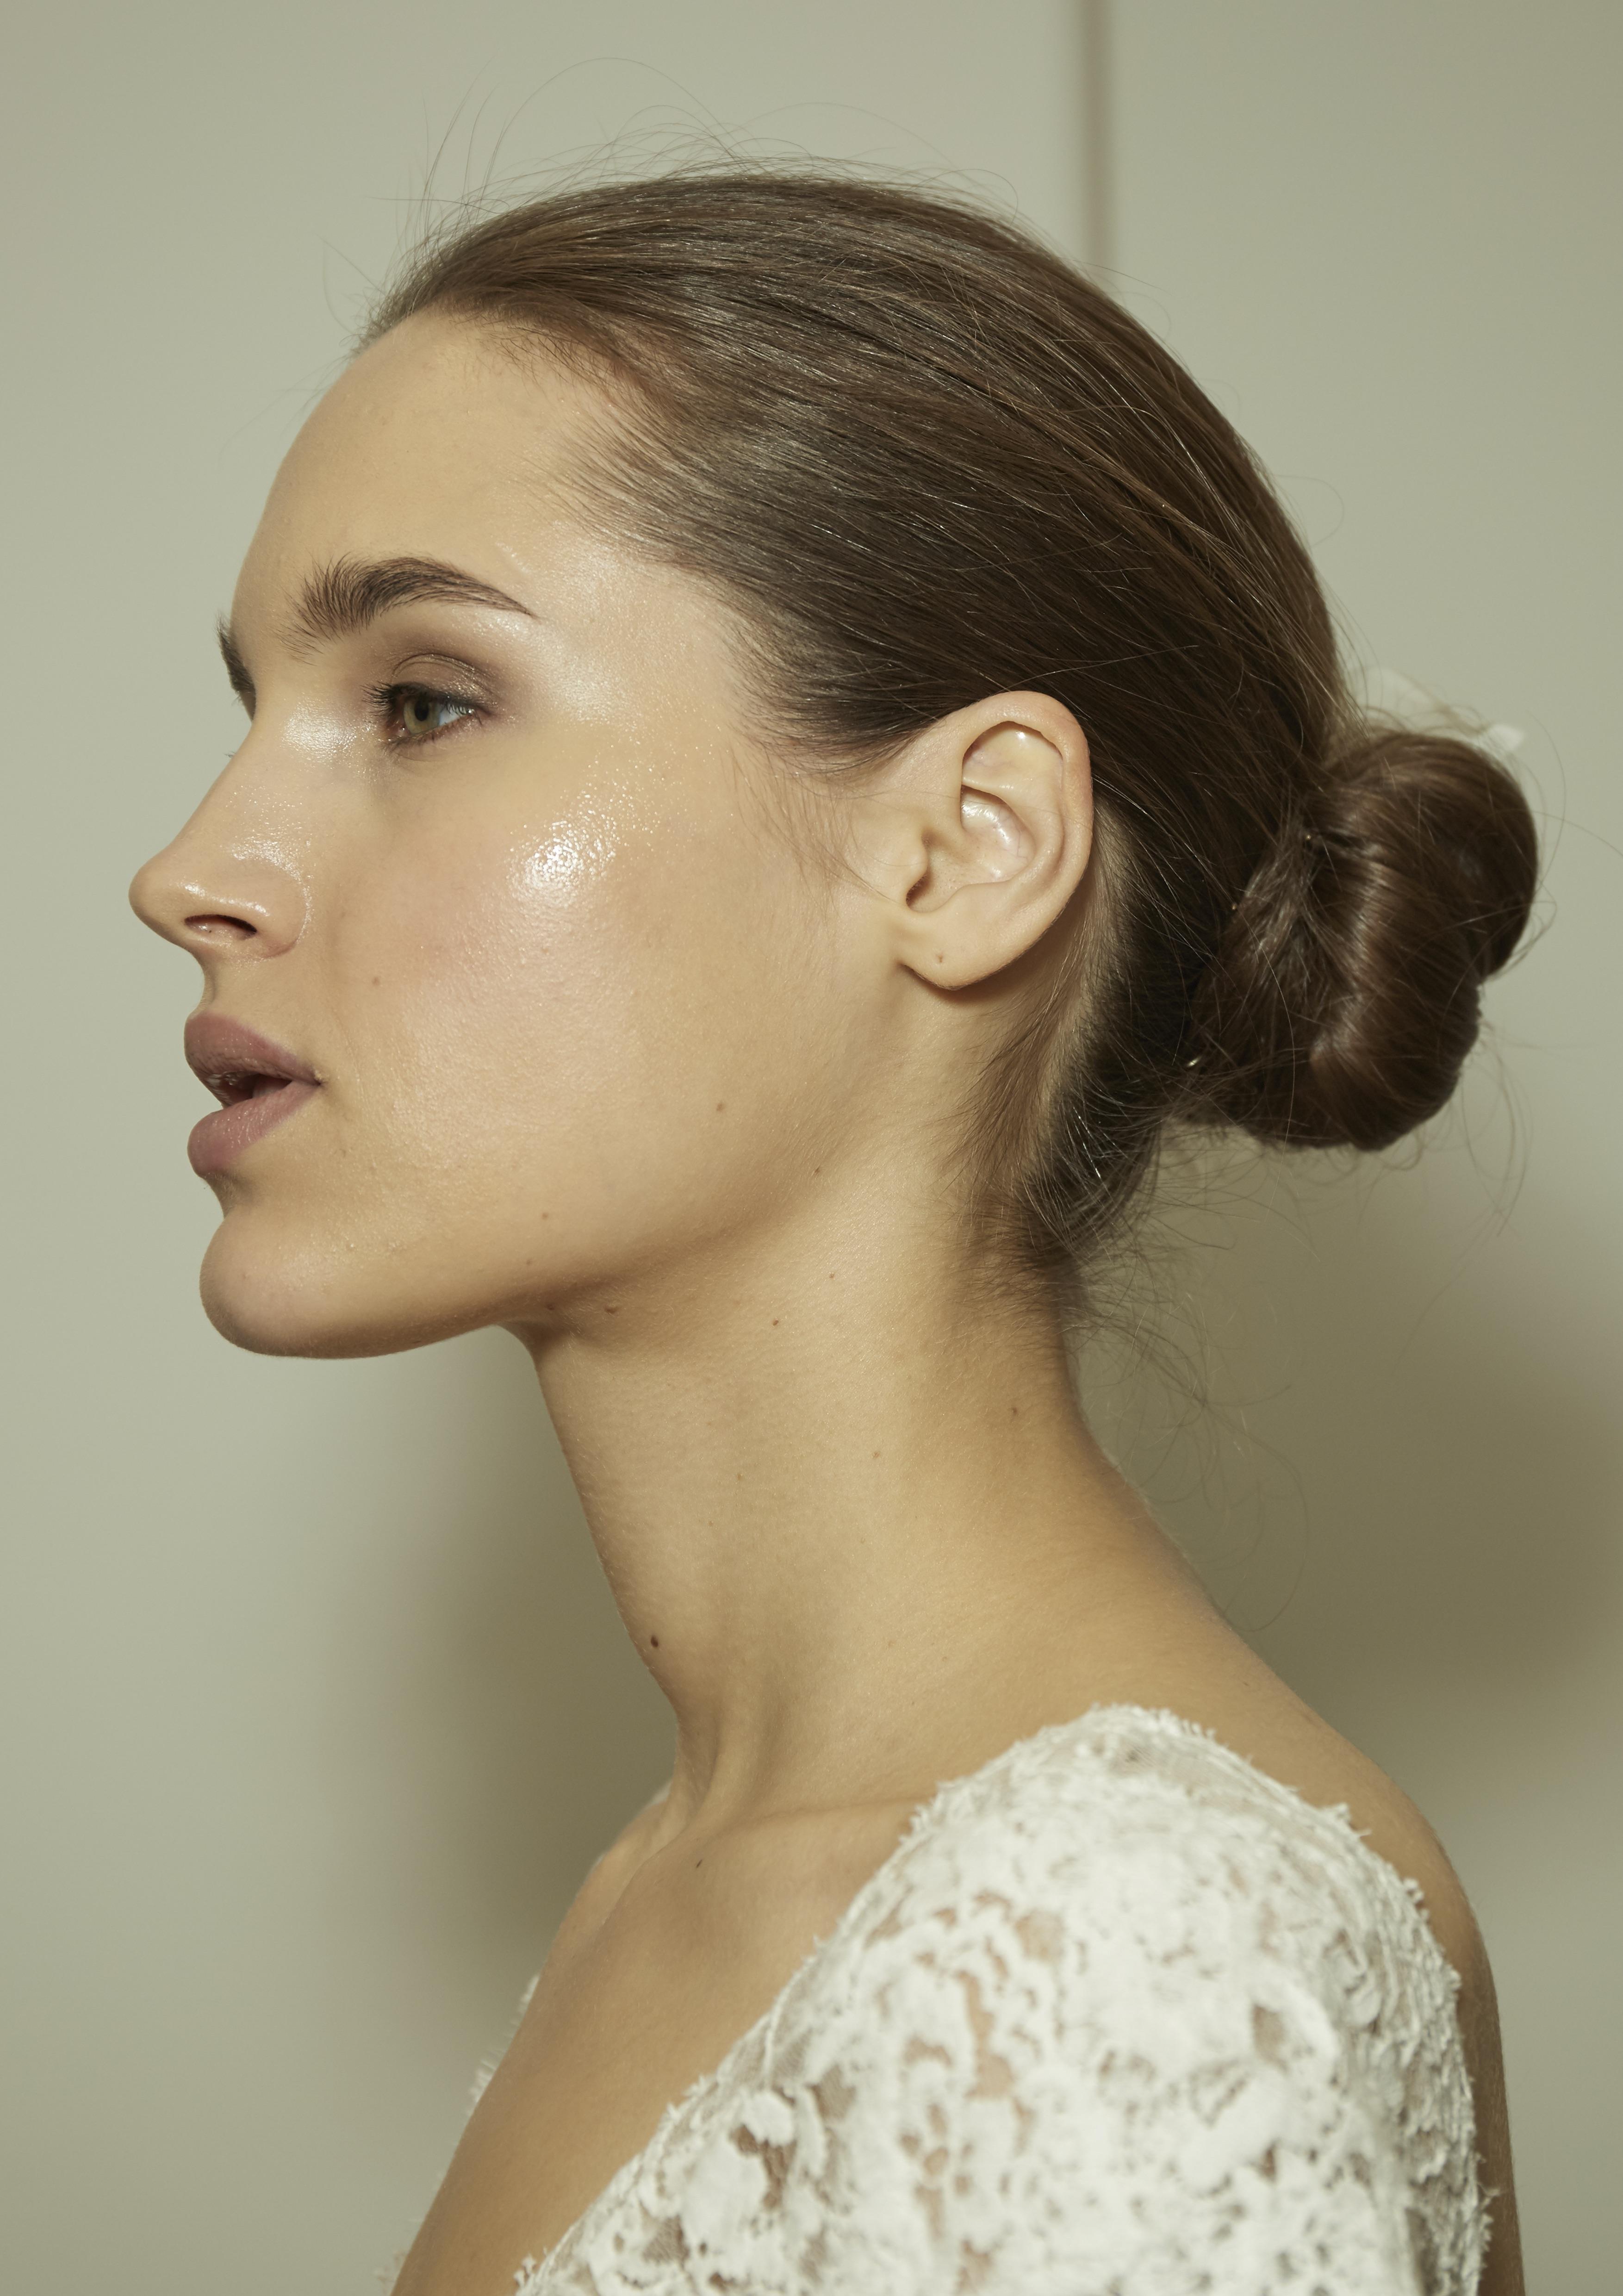 Monique Lhuillier Bridal Fashion Week Spring 2018 Beauty Look